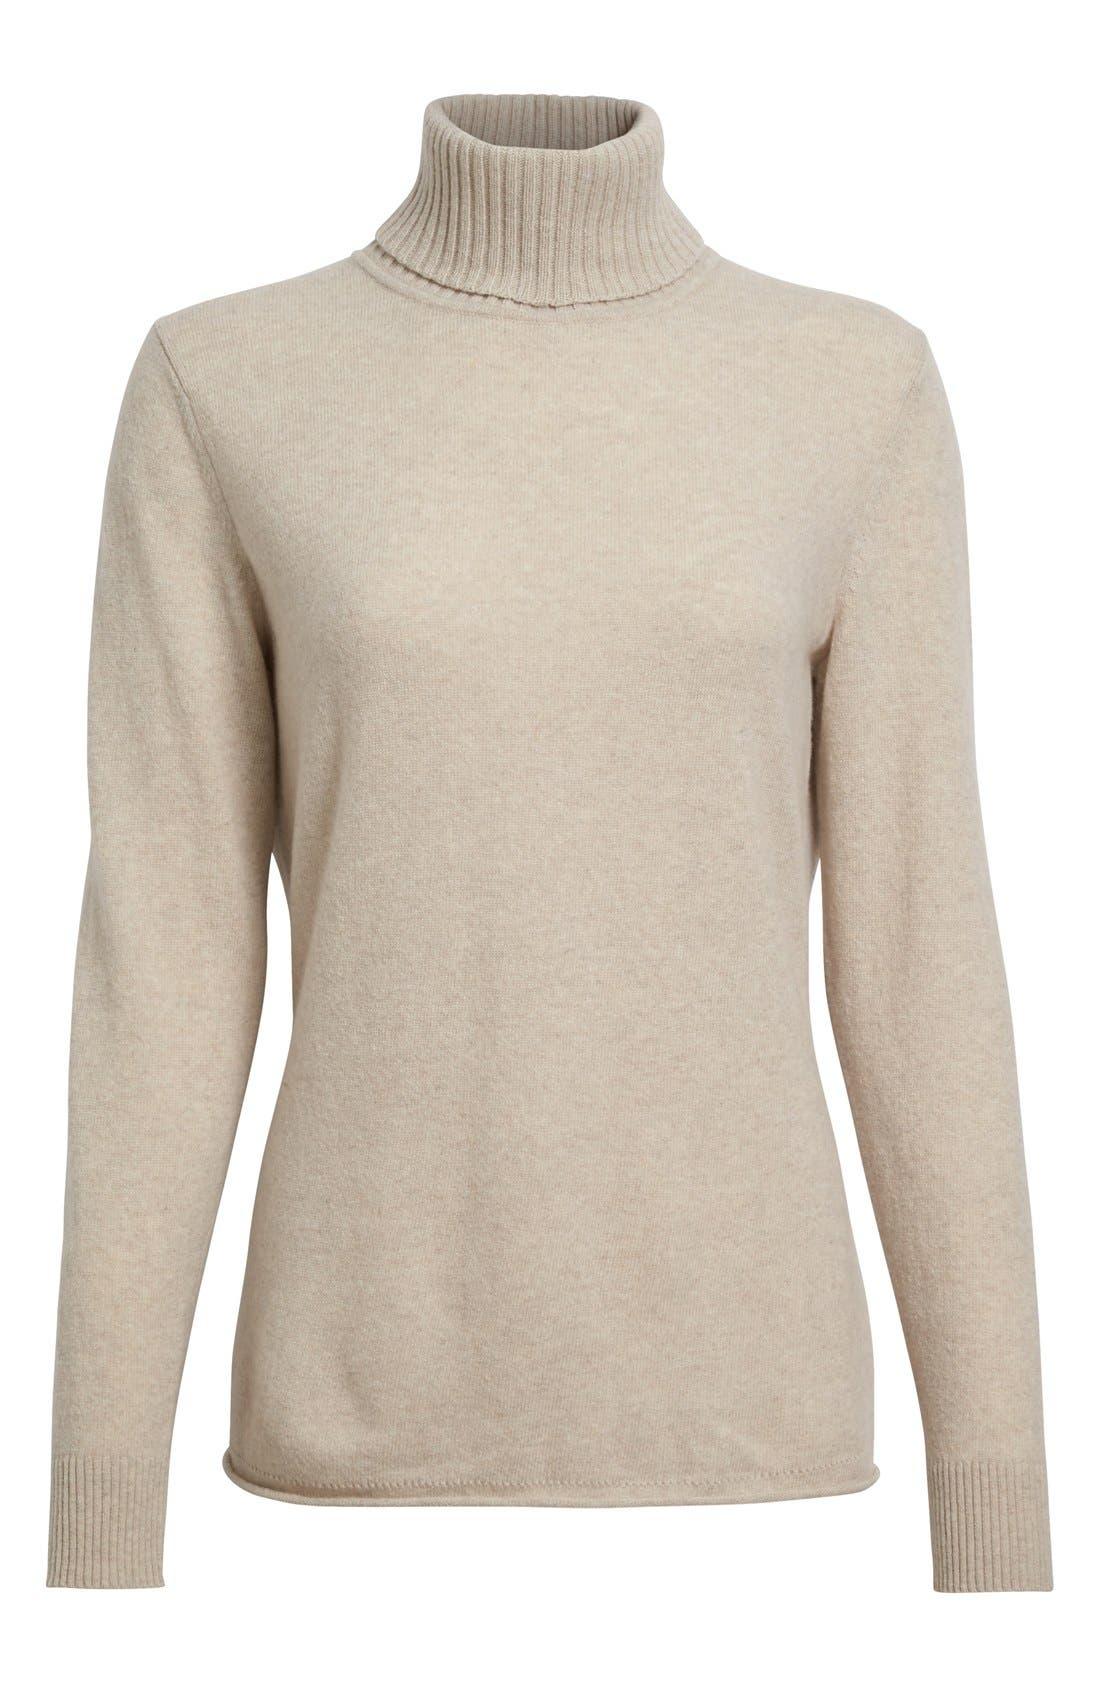 Alternate Image 4  - Lafayette 148 New York Wool & Cashmere Turtleneck Sweater